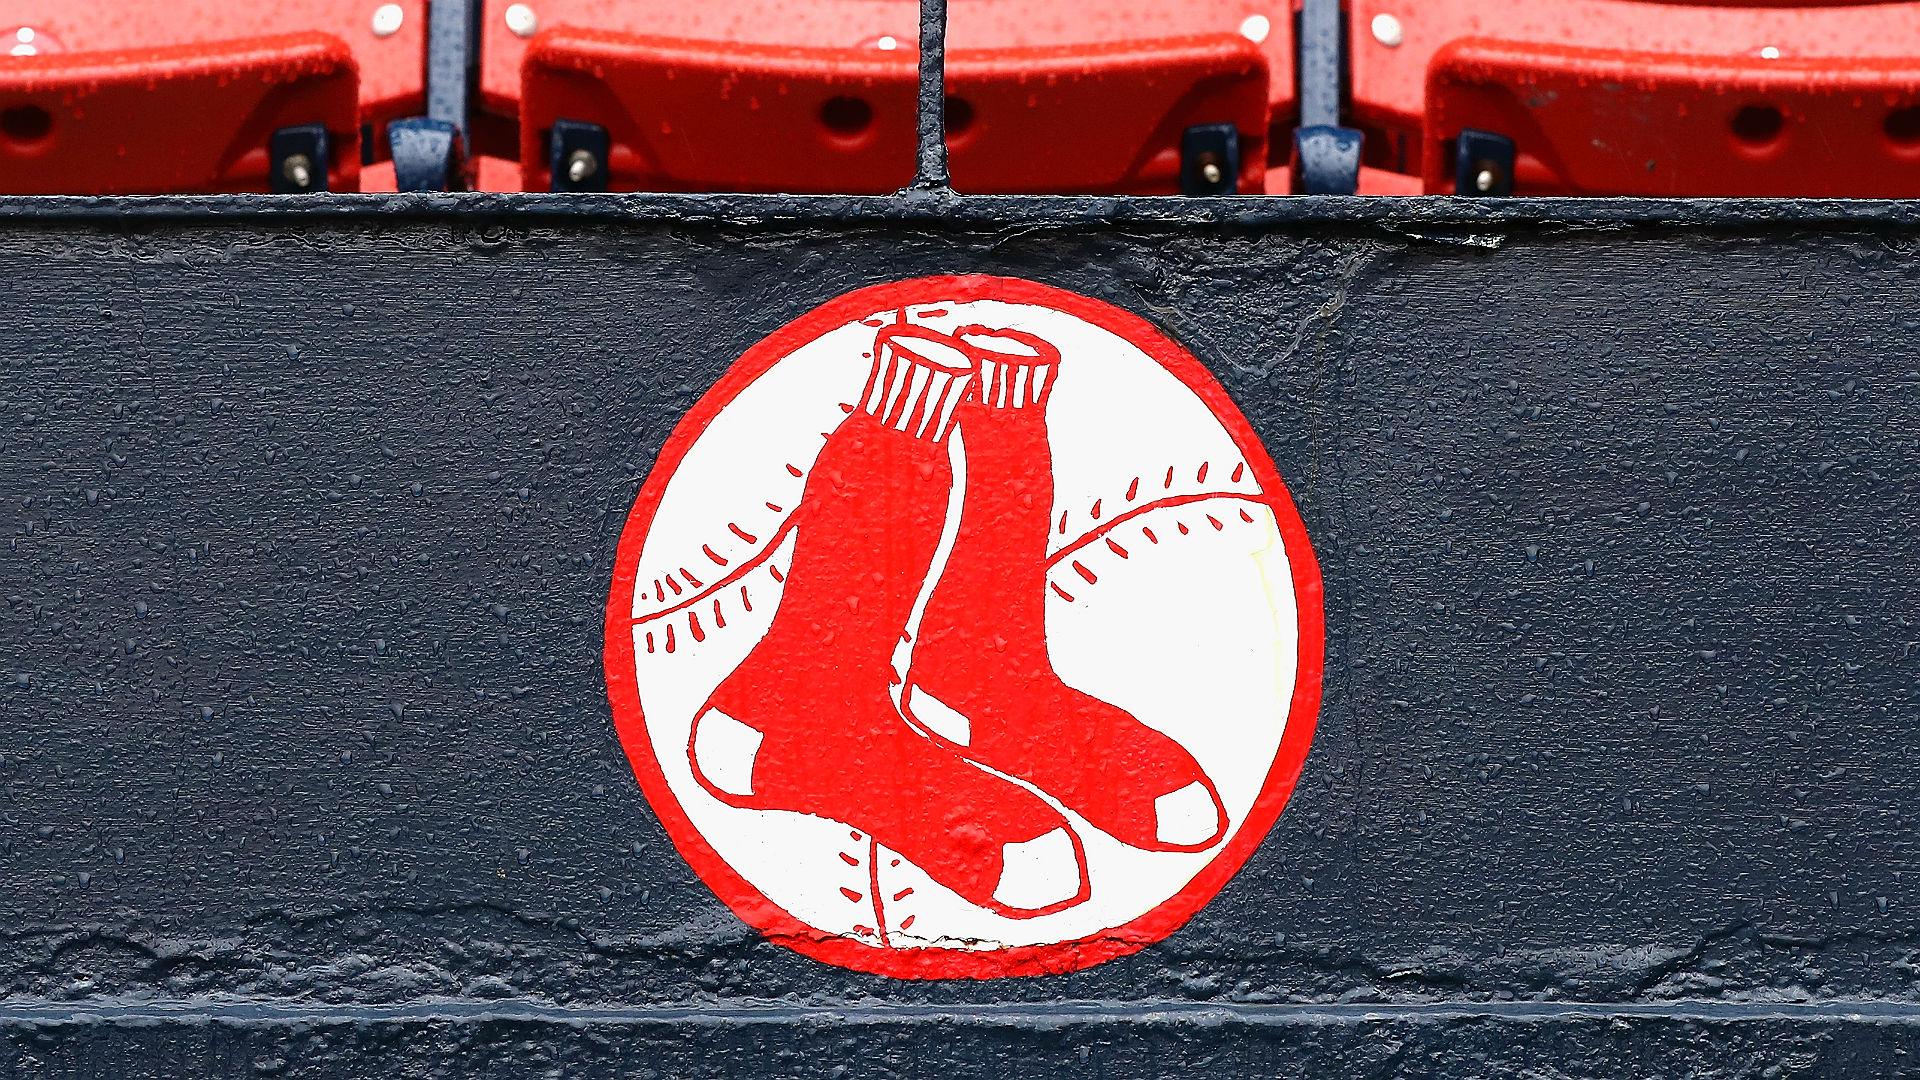 Red Sox quarantine Taiwanese prospect over coronavirus concerns - sporting news